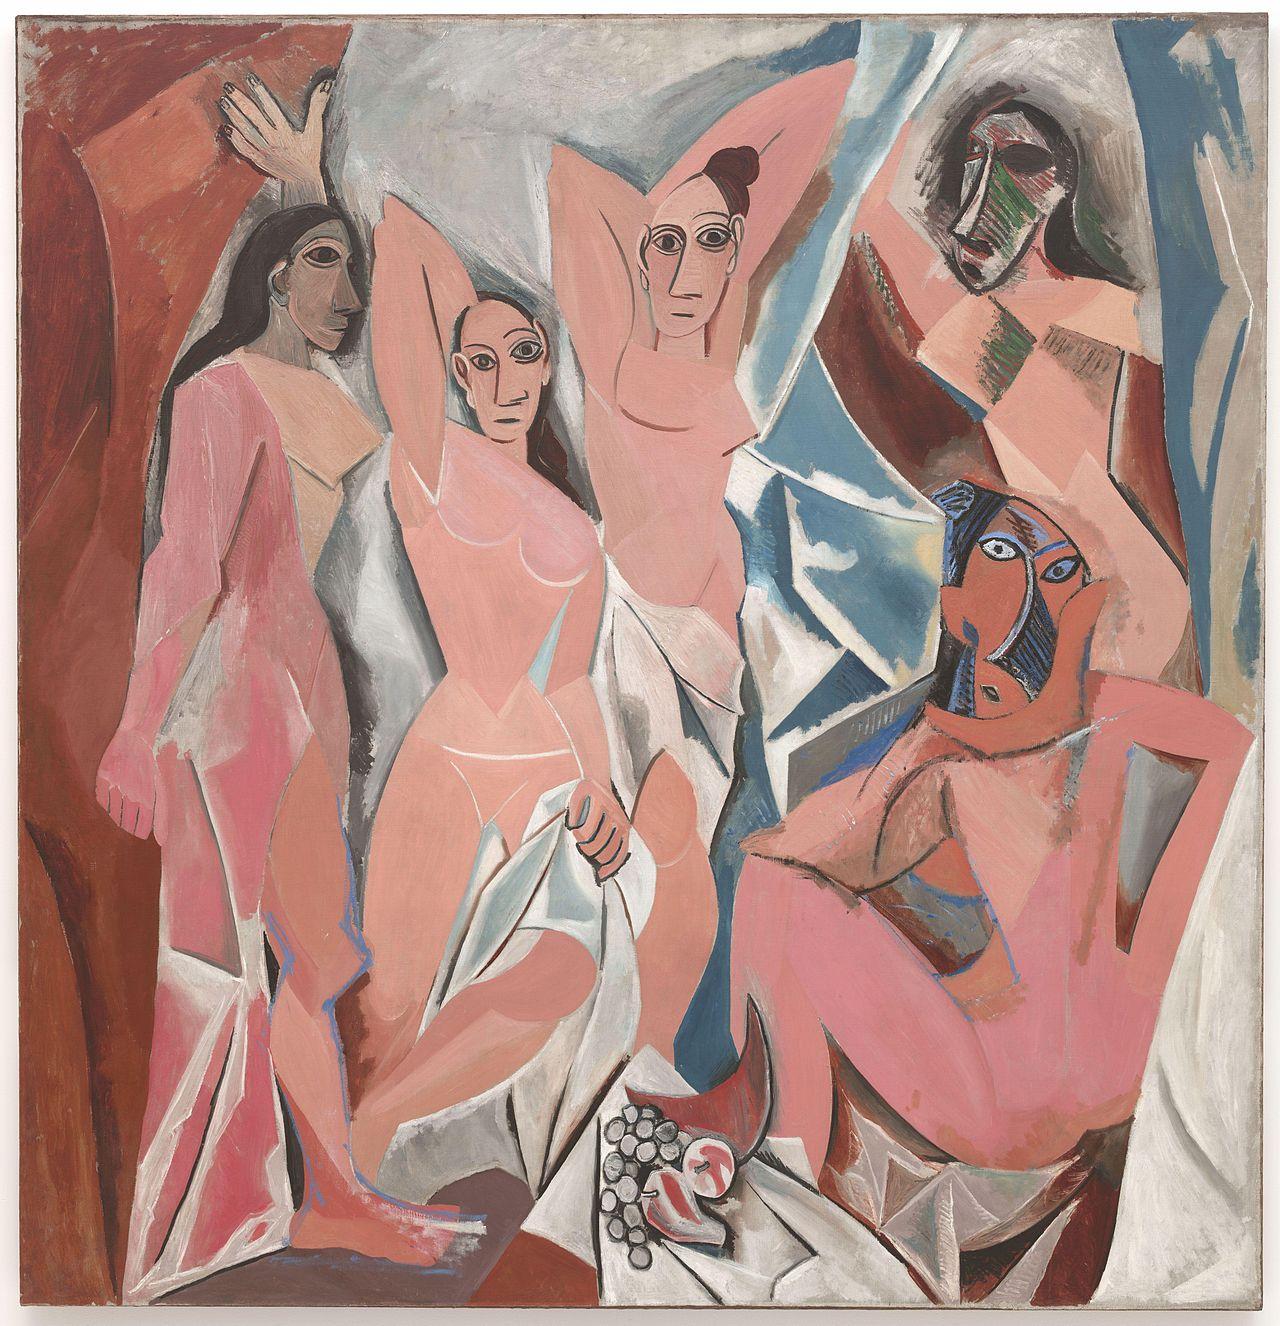 Pablo Picasso,  Les Demoiselles d'Avignon (The Young Ladies of Avignon),  Originally titled: The Brothel of Avignon , 1907, Museum of Modern Art, New York.